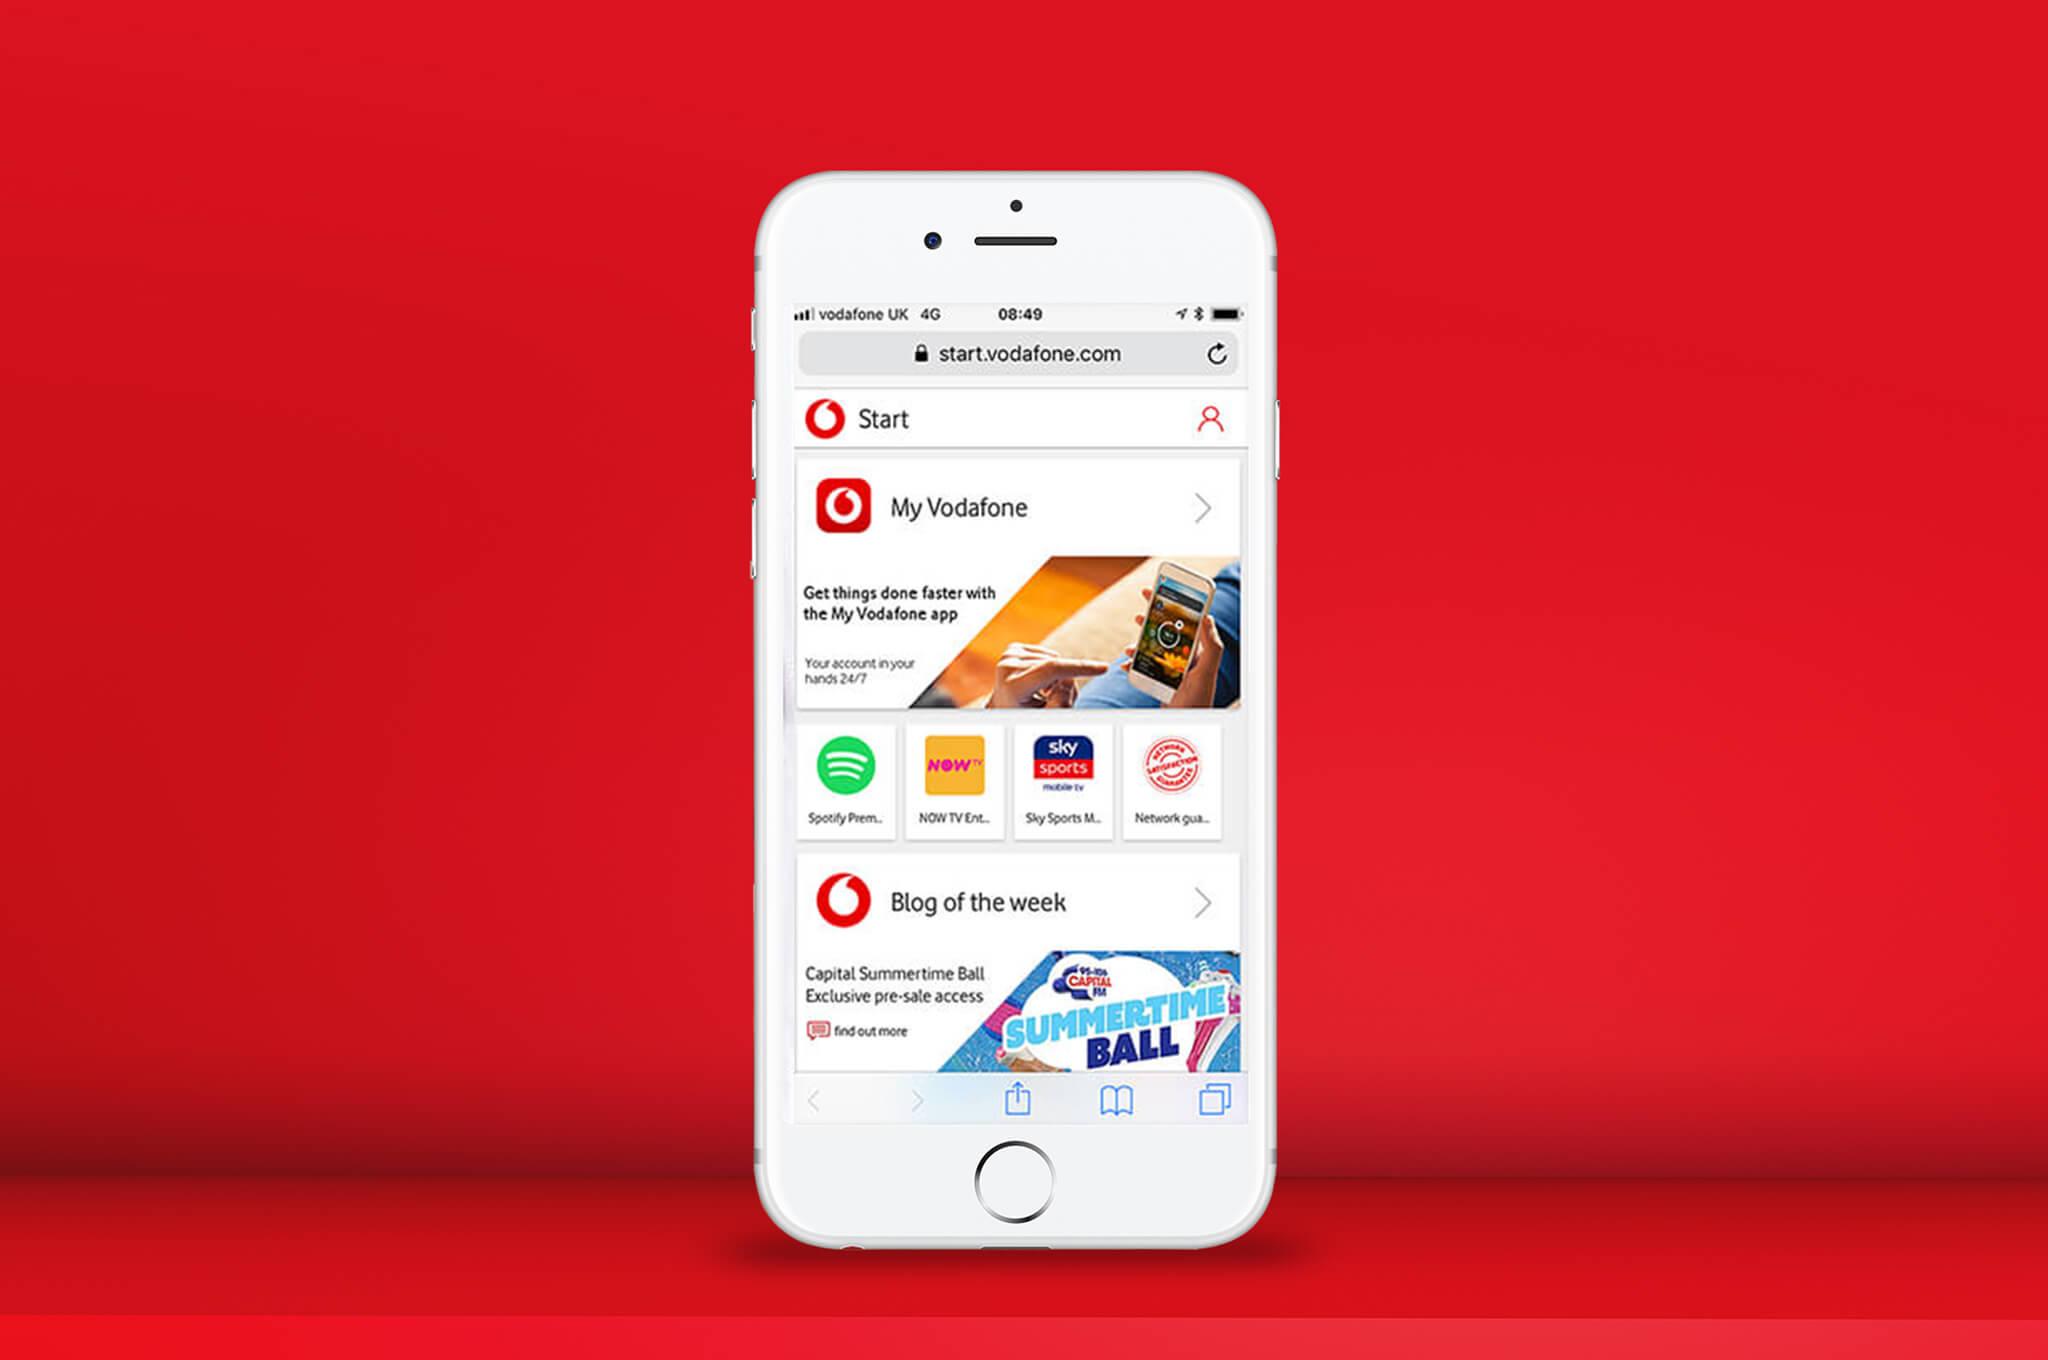 Vodafone Start | Start making the most of us